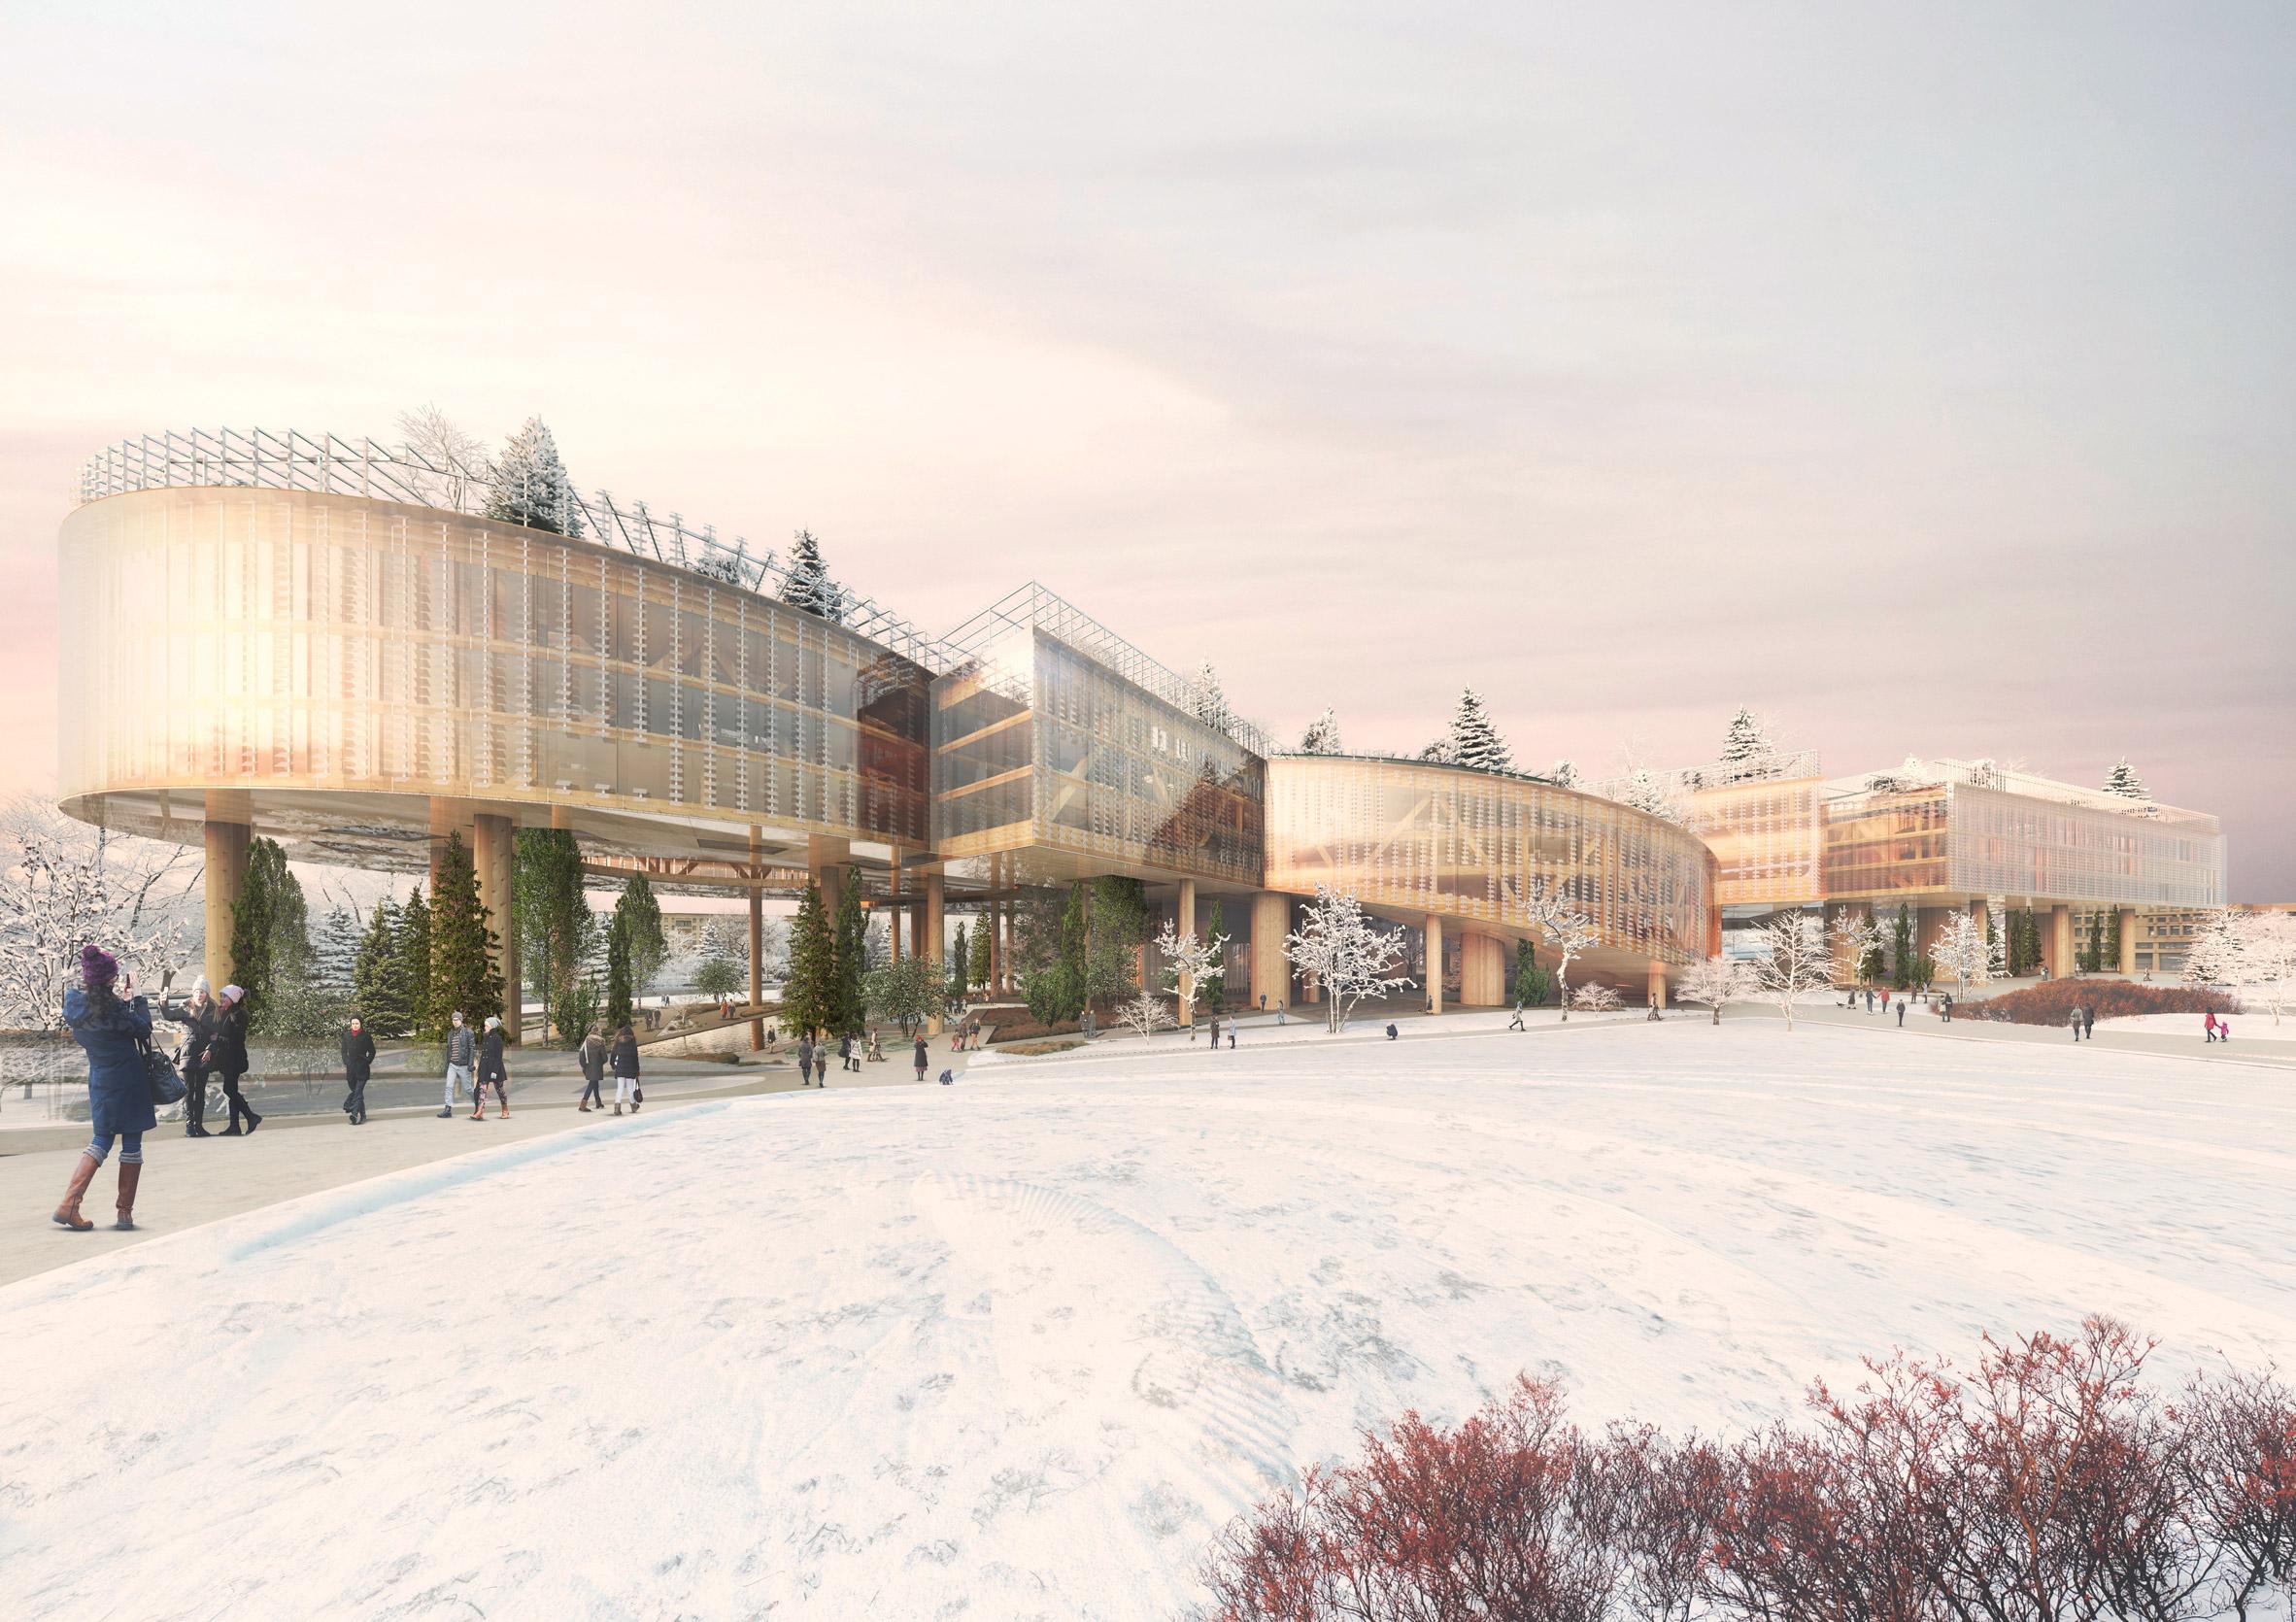 Gazprom Neft headquarters in Saint Petersburg by MVRDV